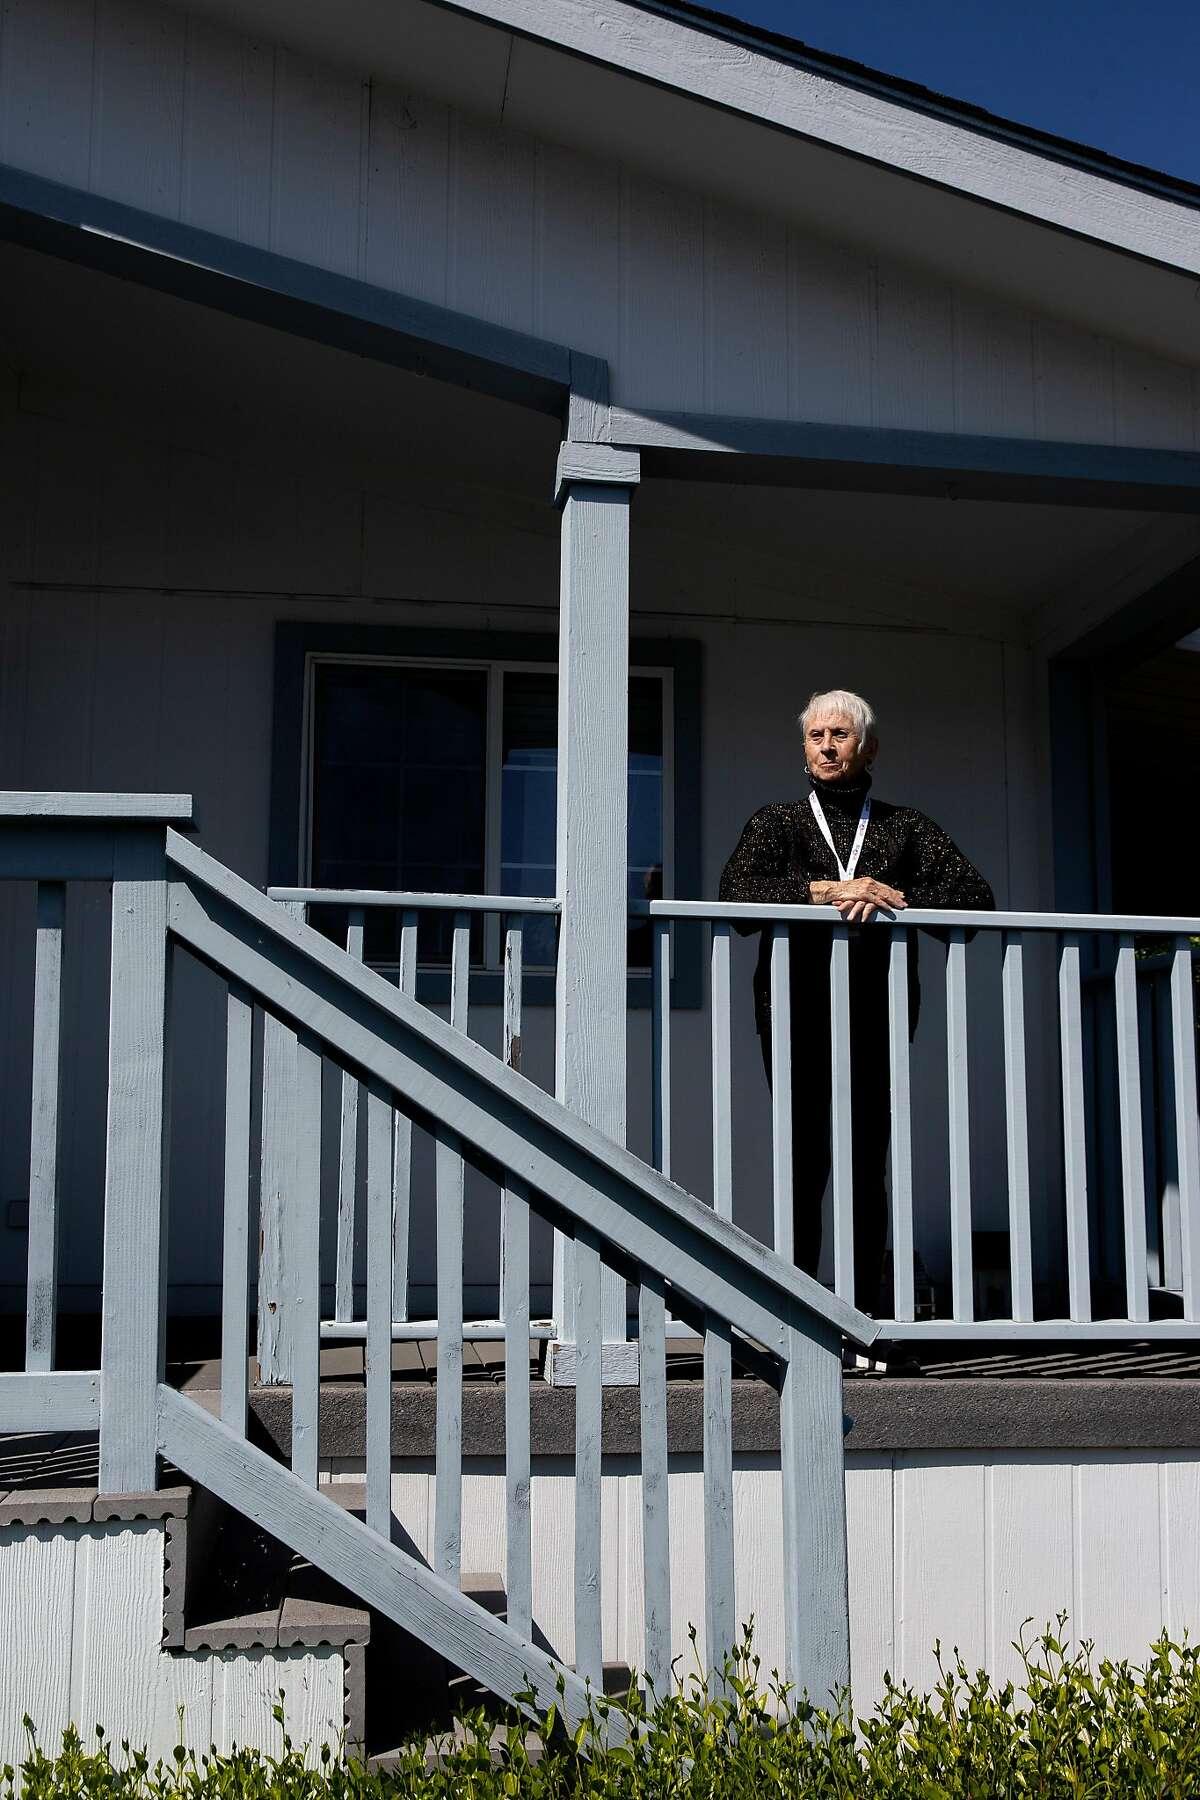 Elizabeth Pecoraro outside her boyfriend's home on Friday, April 3, 2020, in San Jose, Calif.